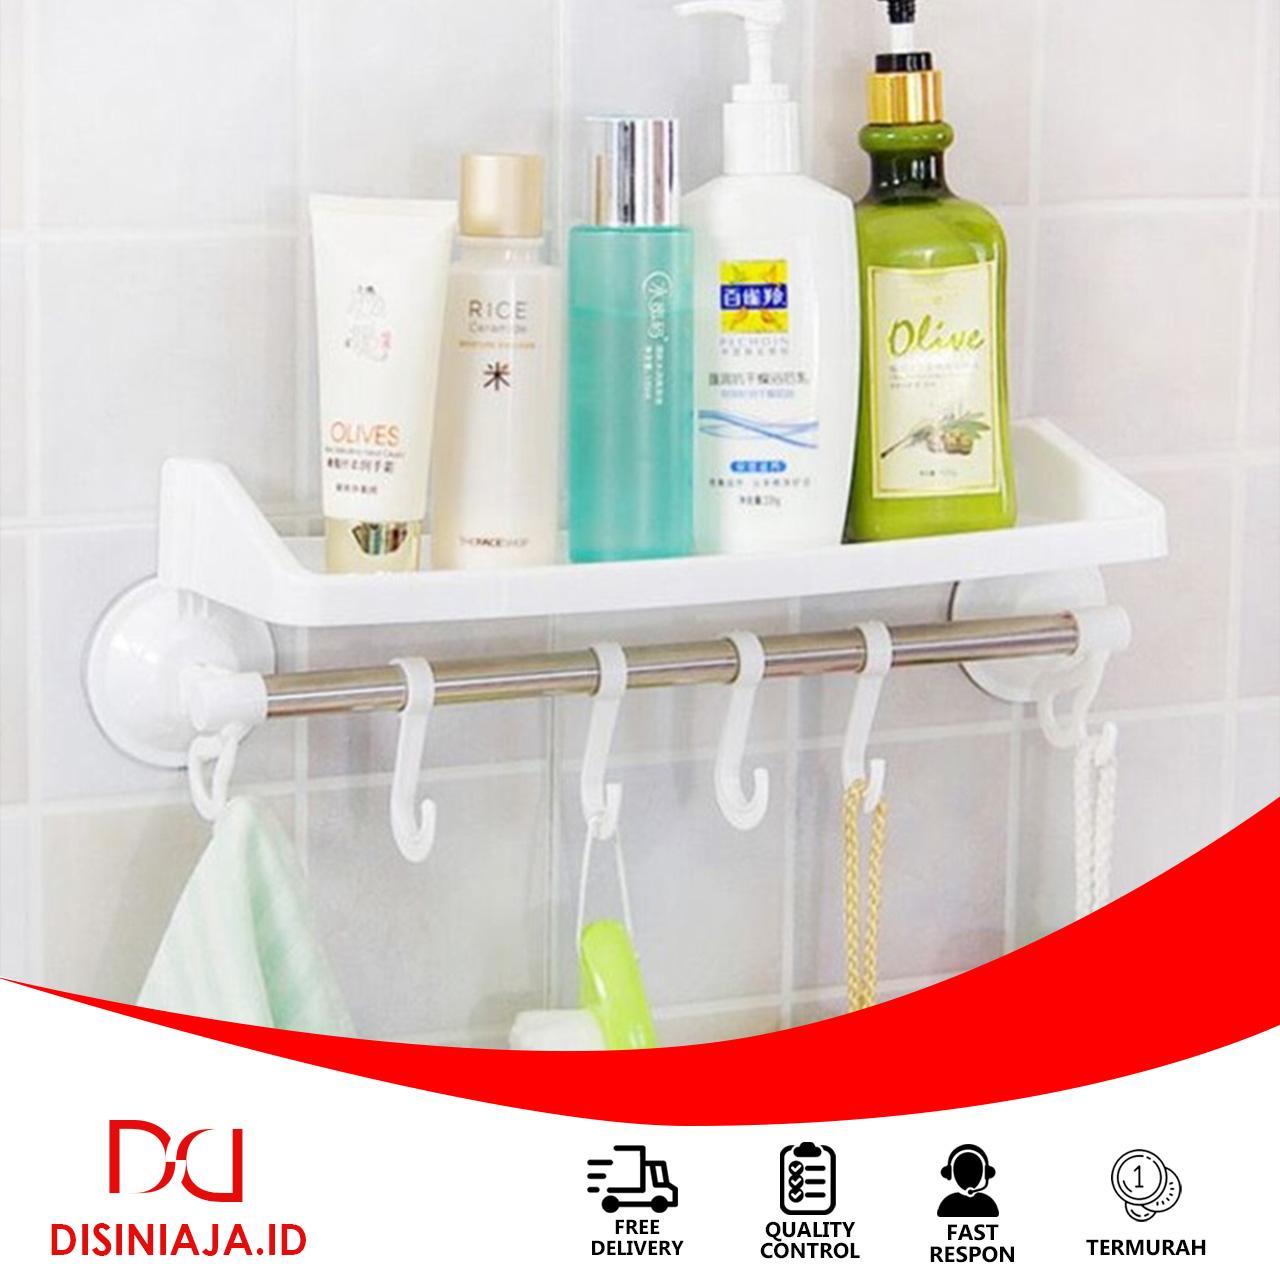 Rak kamar mandi tempat shampoo handuk odol sabun / rak gantung tempel  dinding toilet